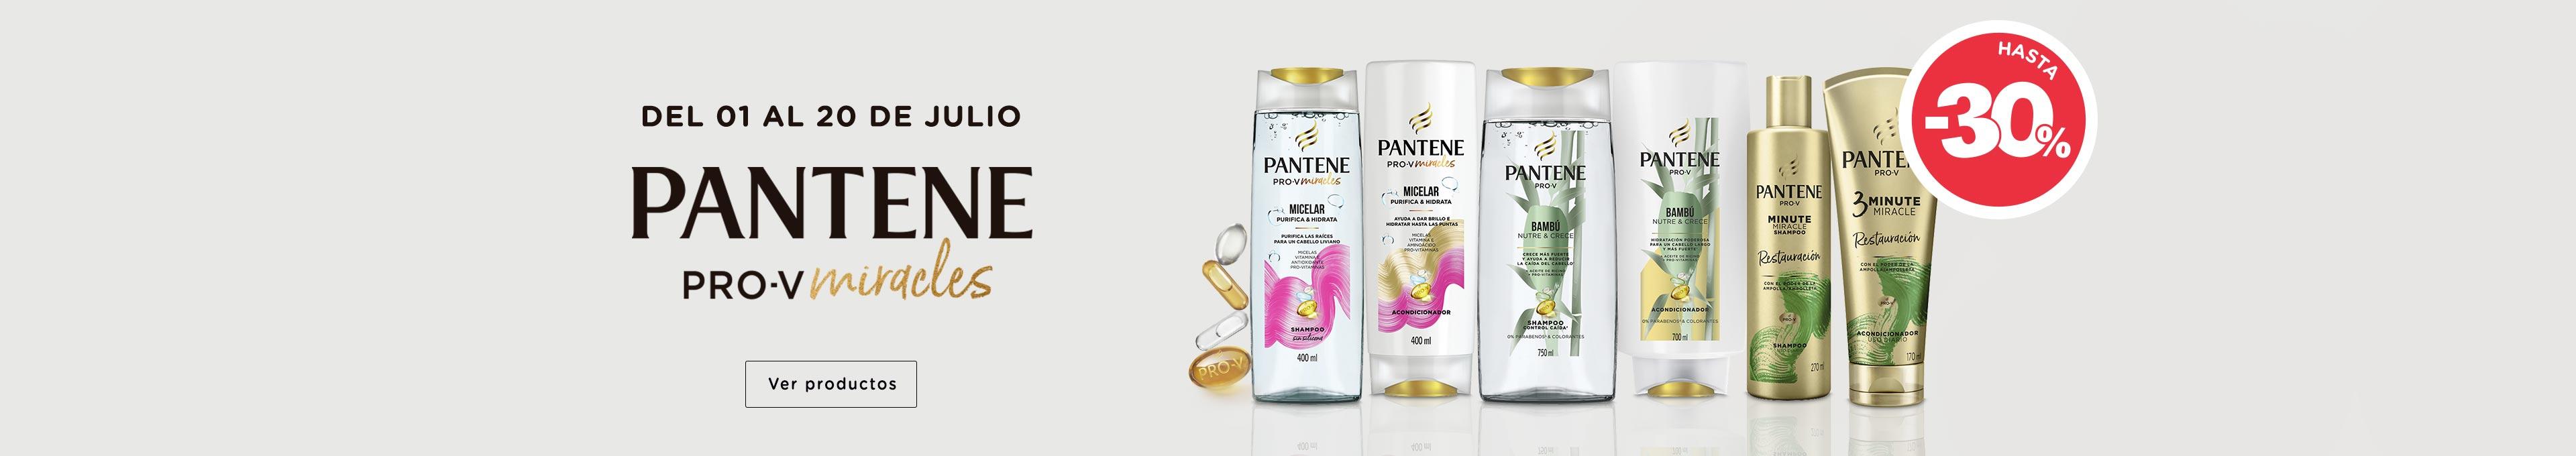 Pantene NewHome